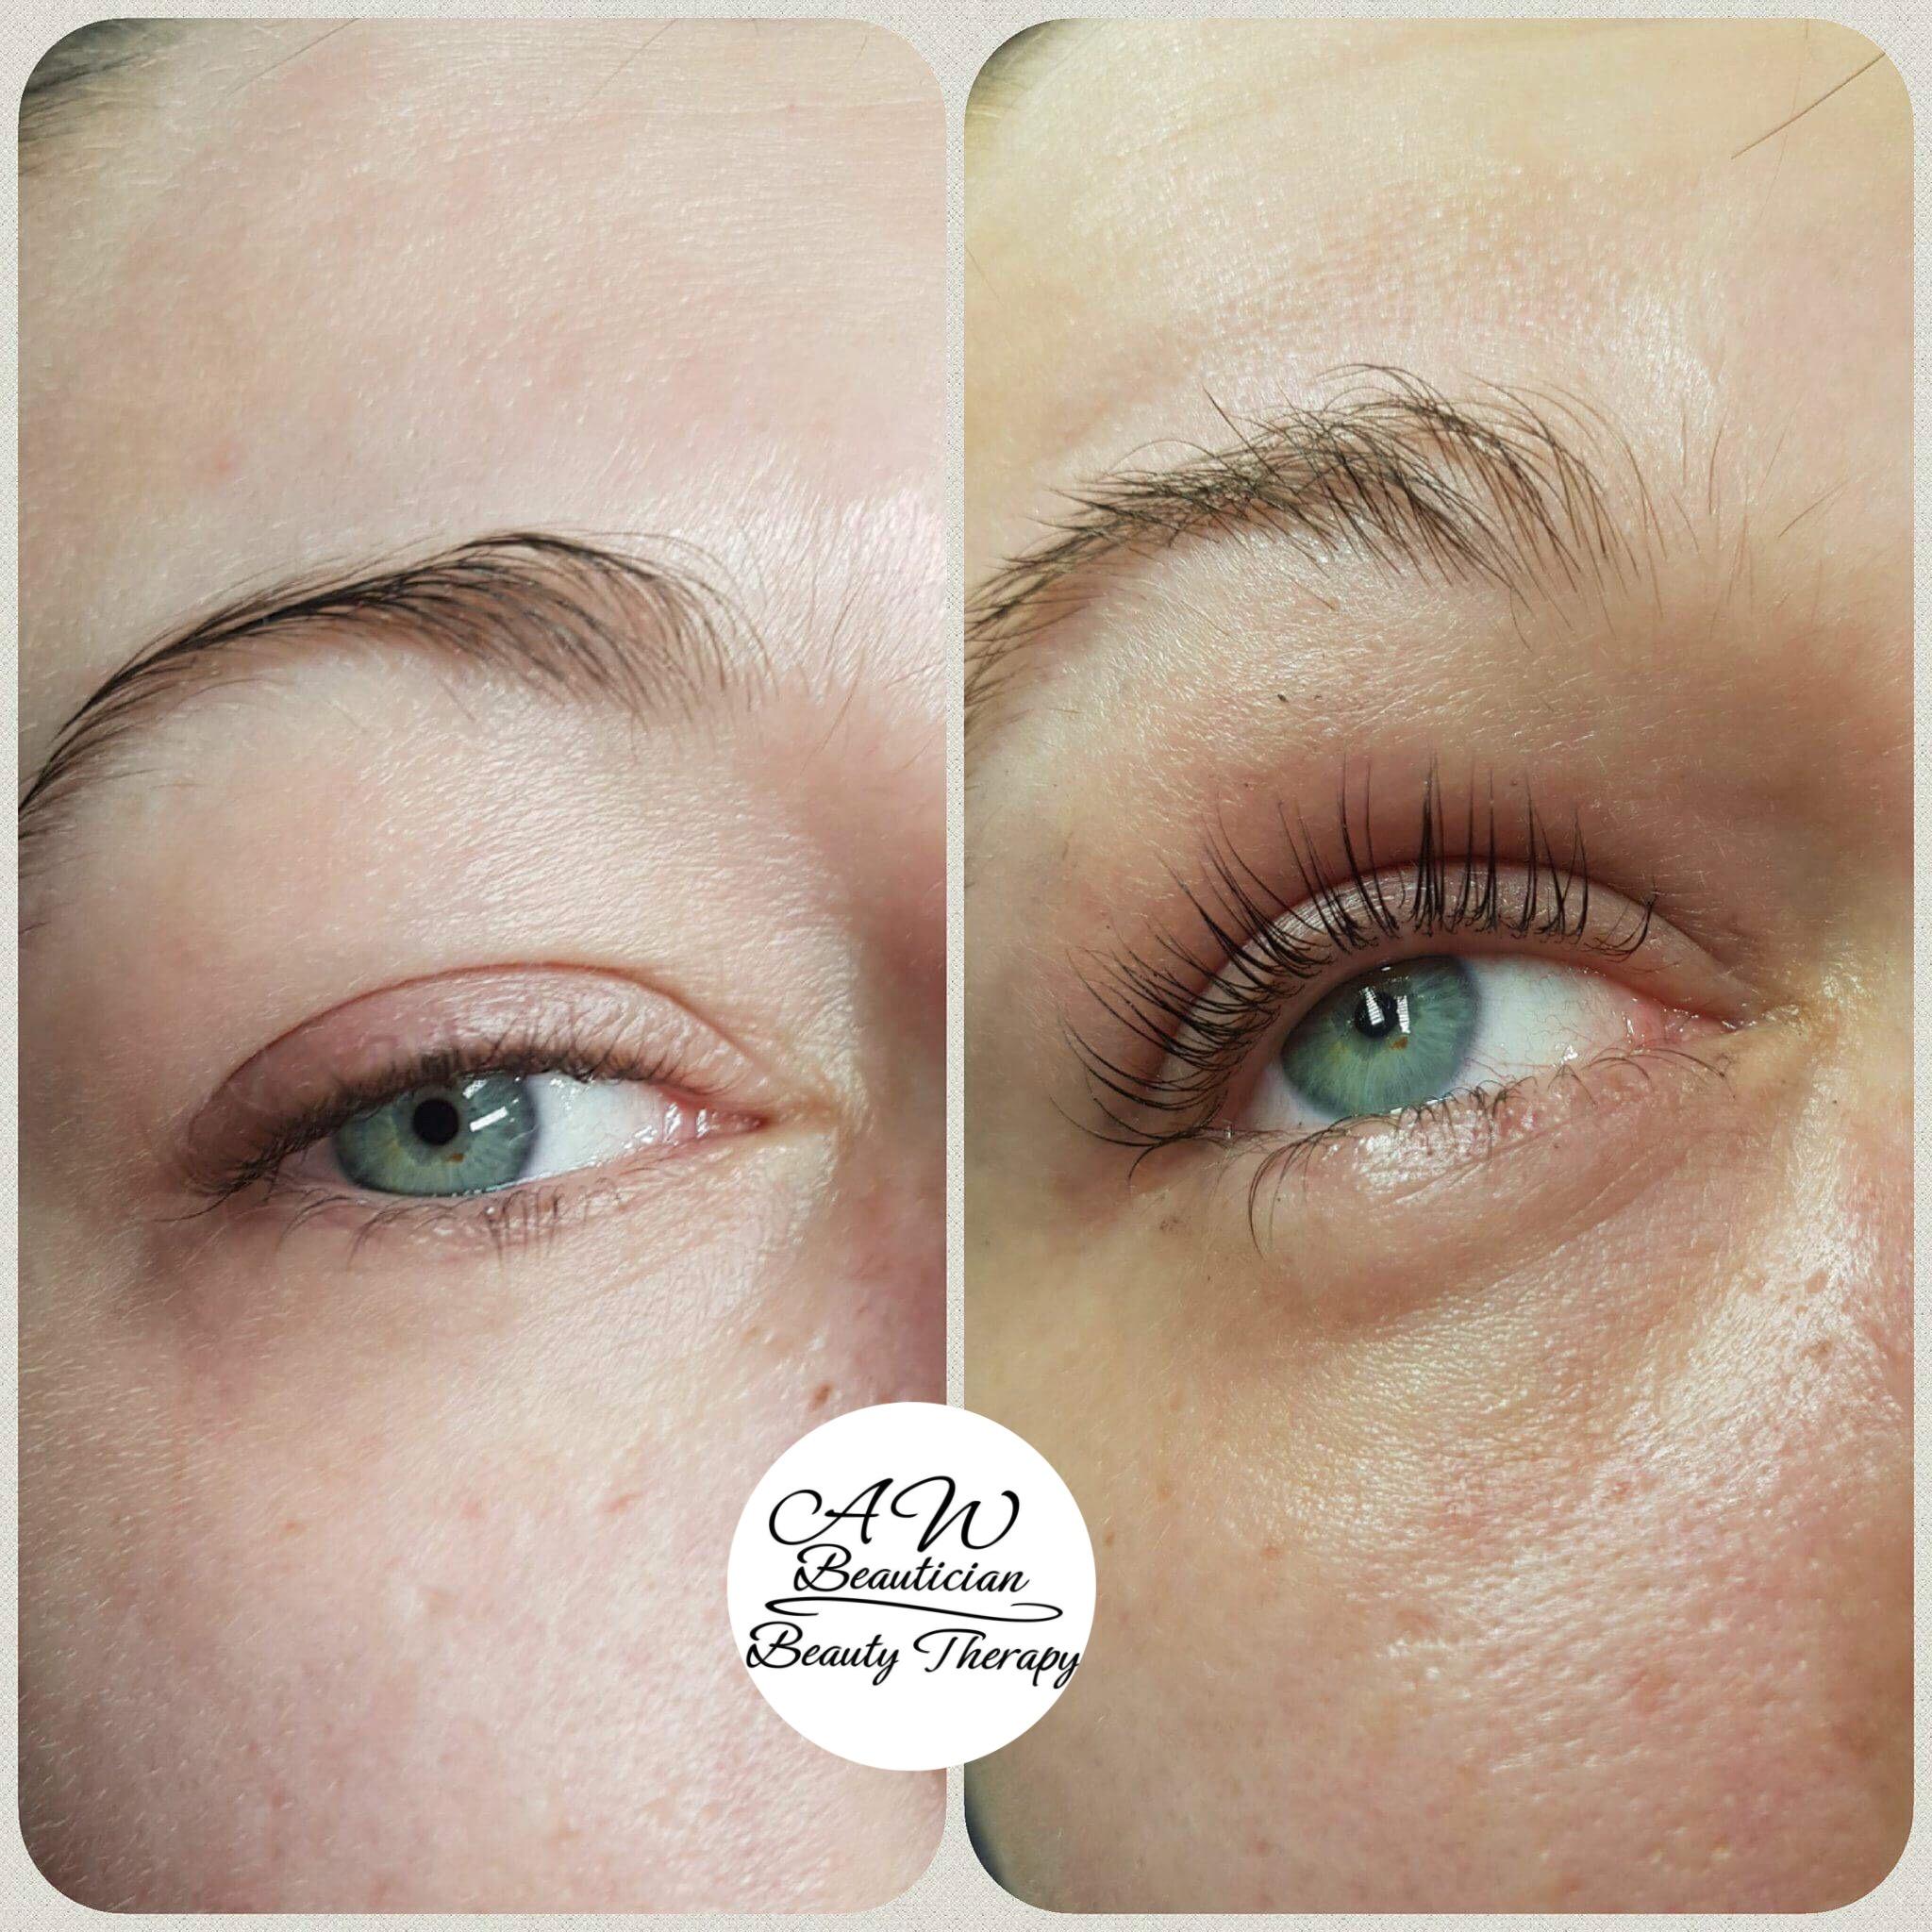 Lift Eyelashes Aw Beautician Edinburgh Beauty Salon Invites You